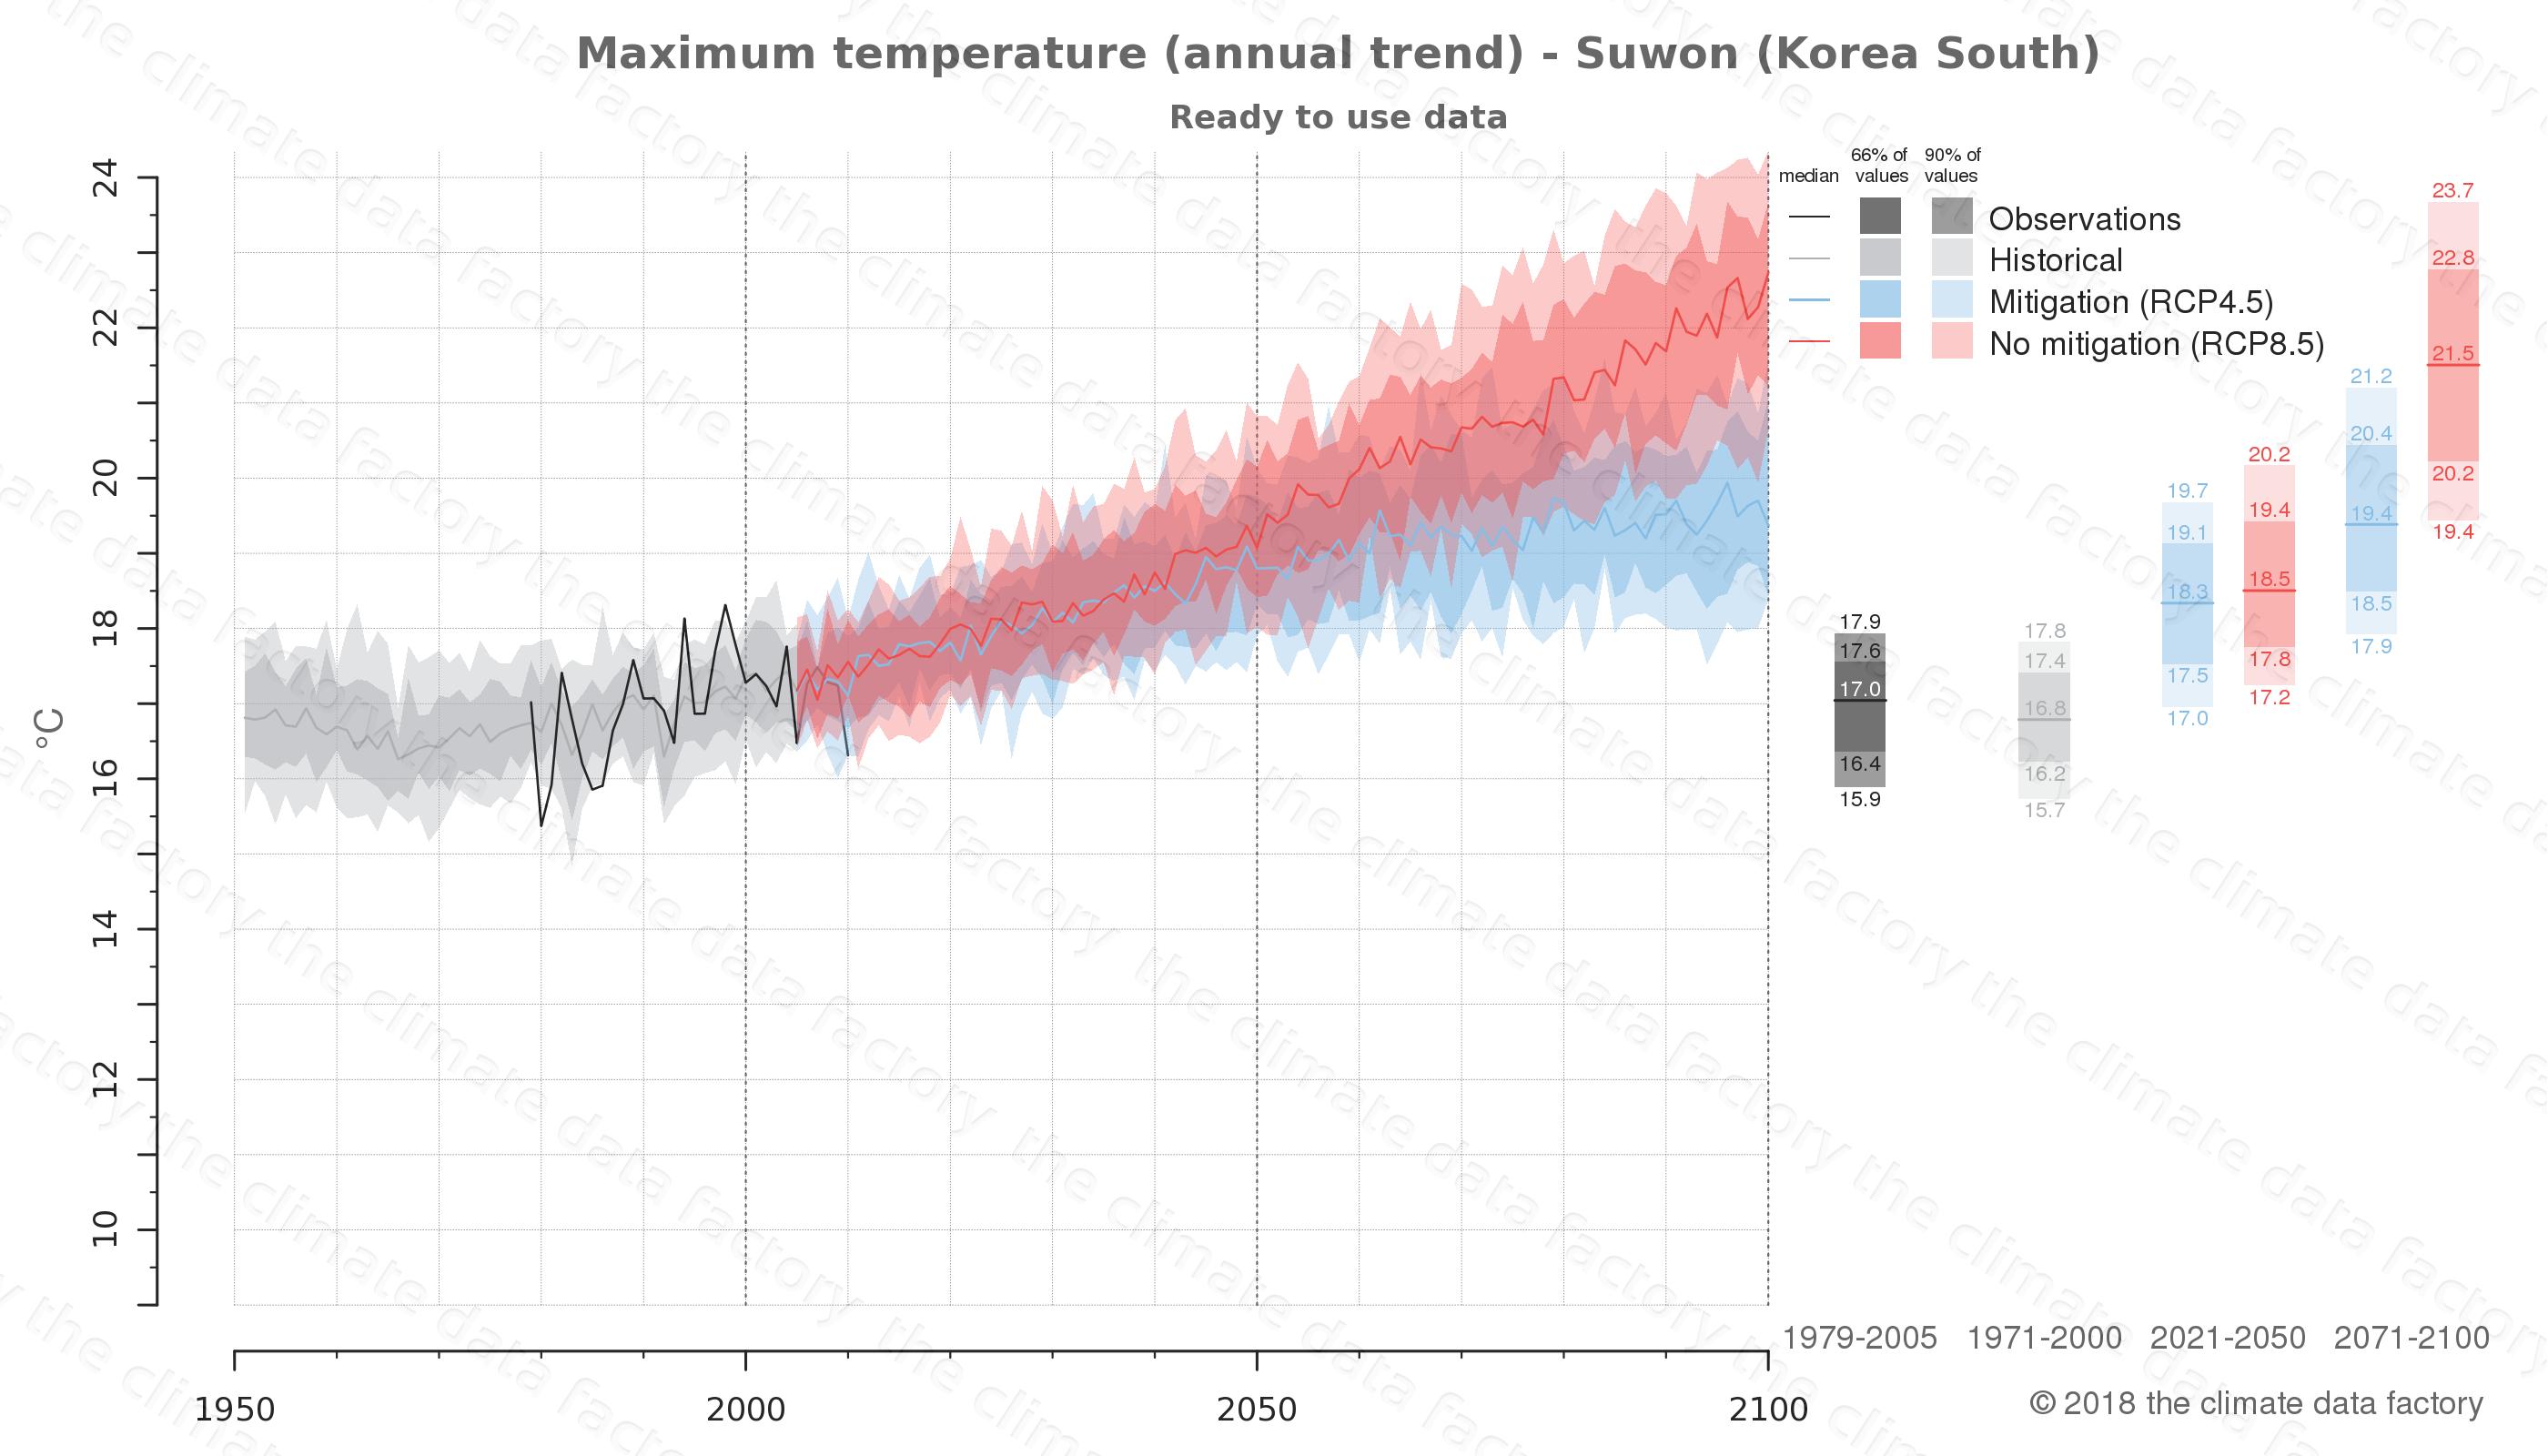 climate change data policy adaptation climate graph city data maximum-temperature suwon south korea